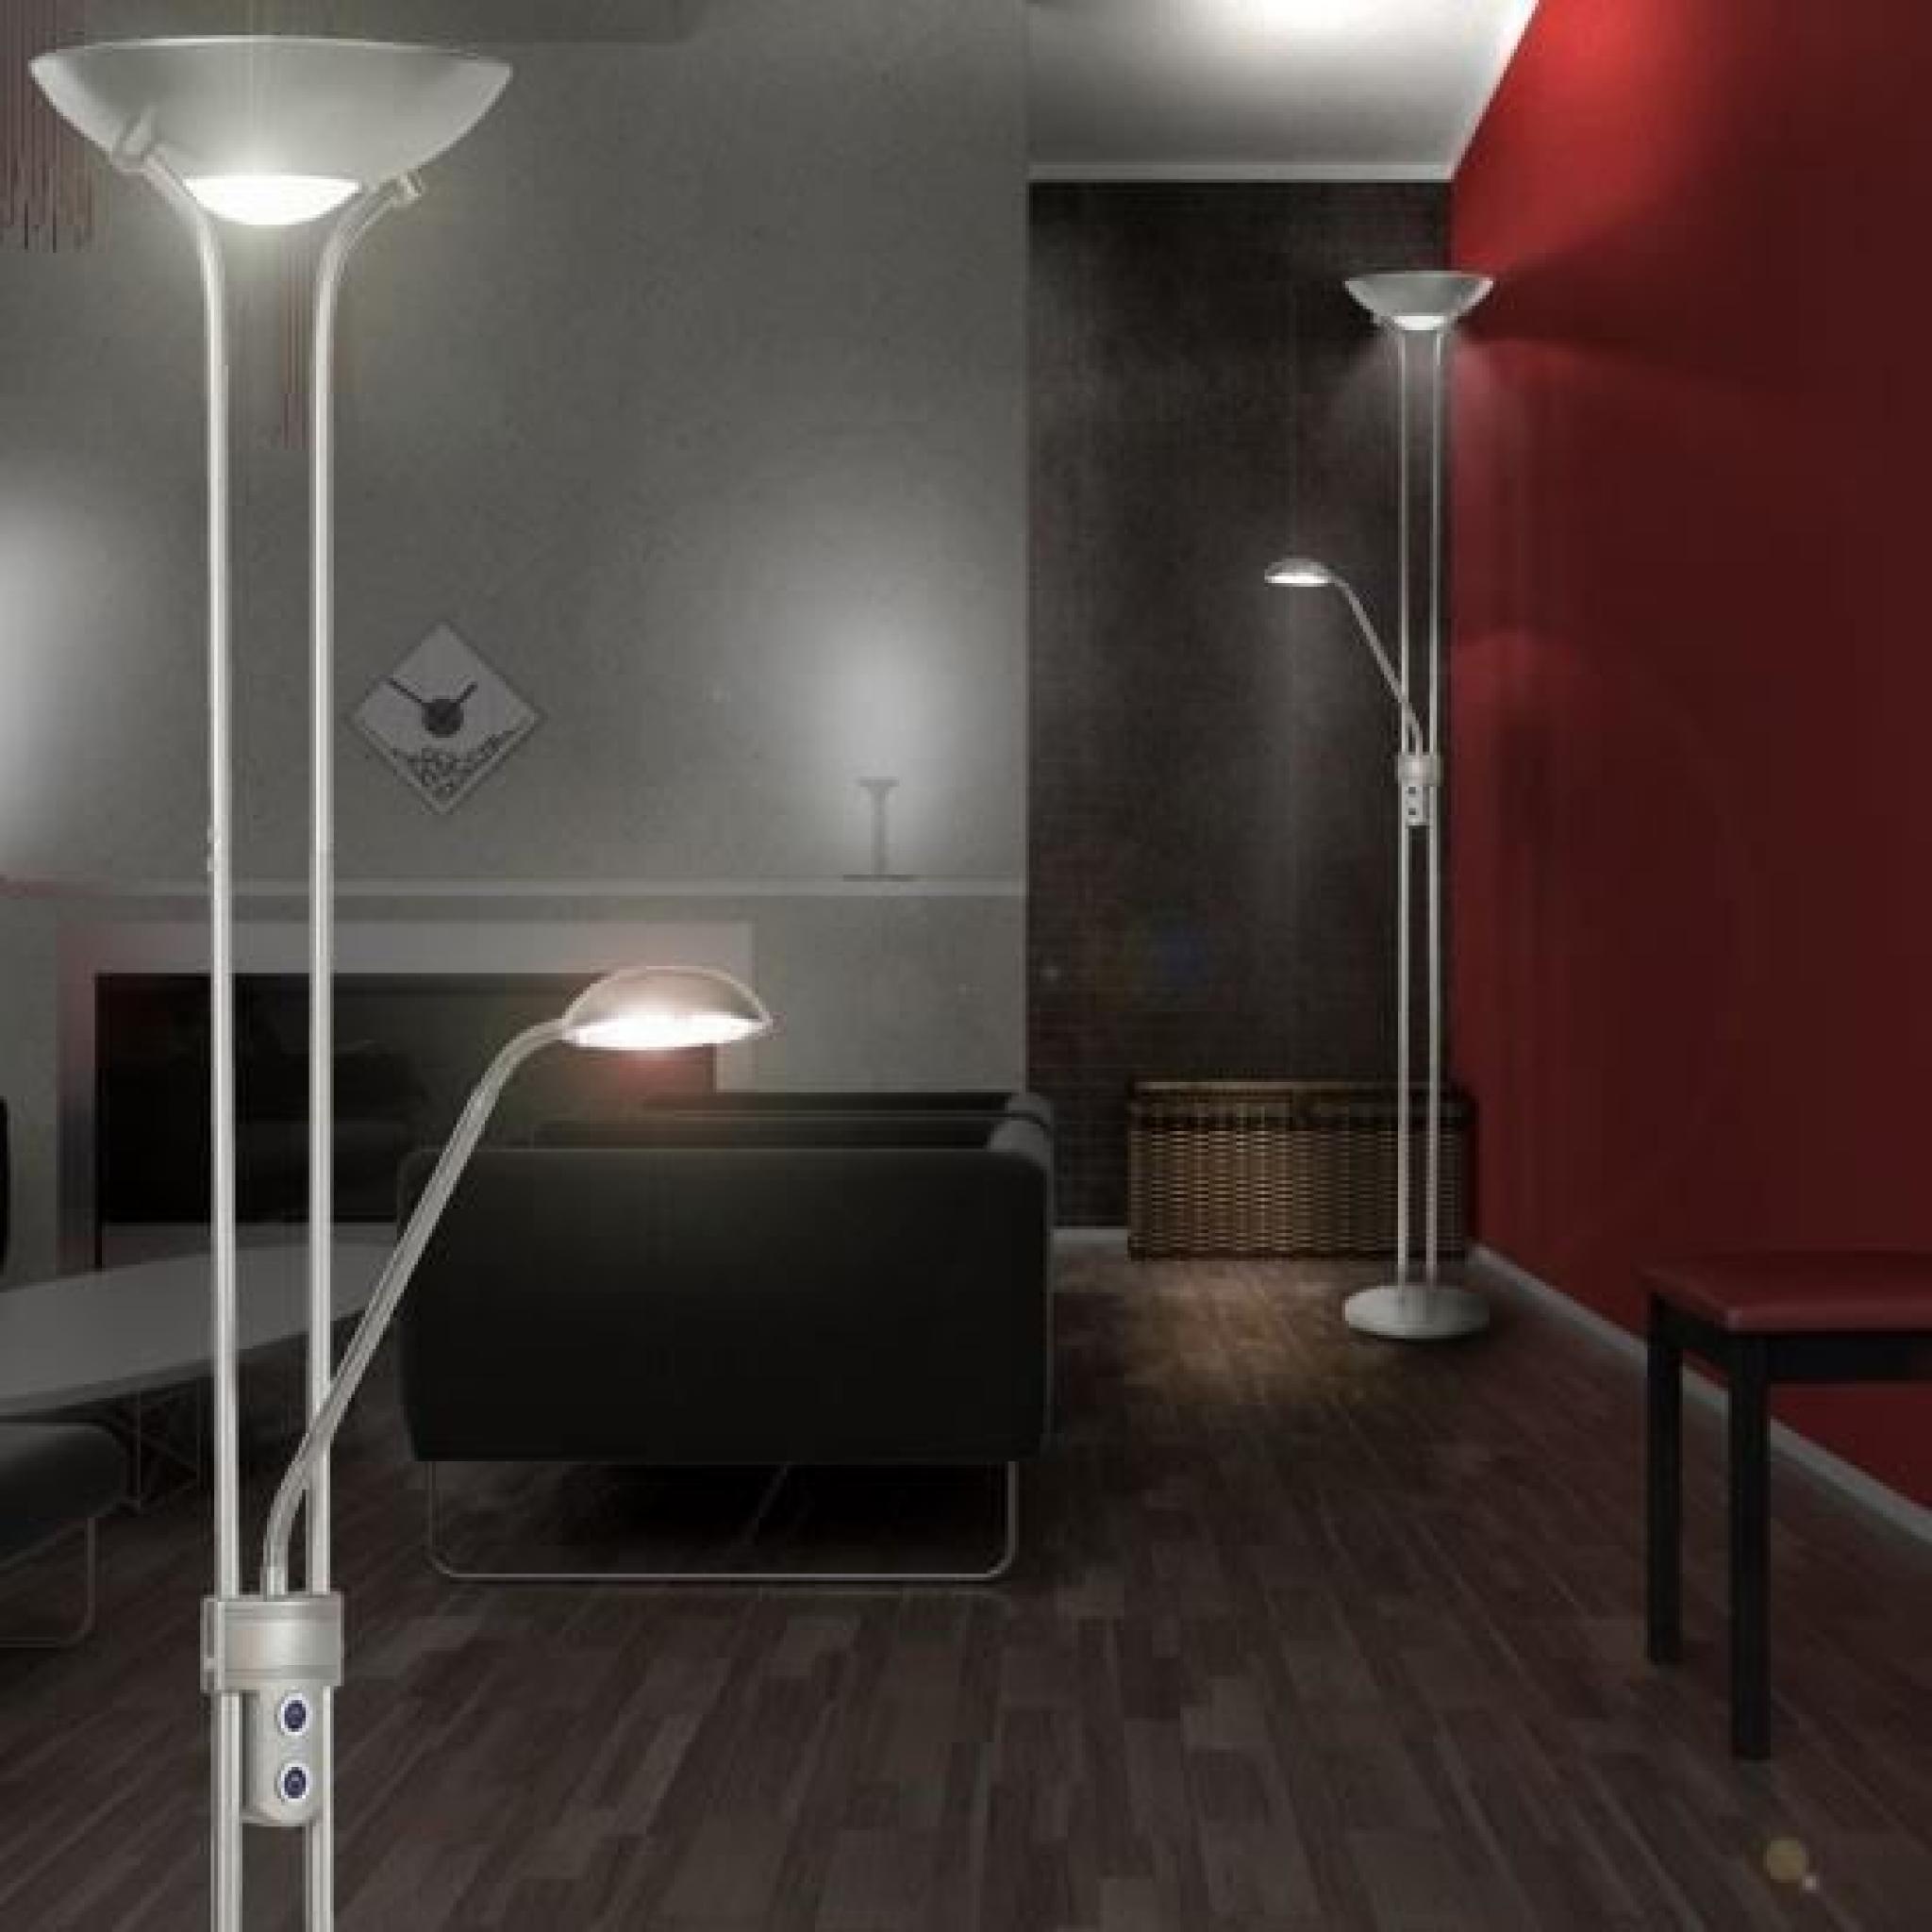 lampadaire led 25 watts luminaire spot interrupteur lampe. Black Bedroom Furniture Sets. Home Design Ideas